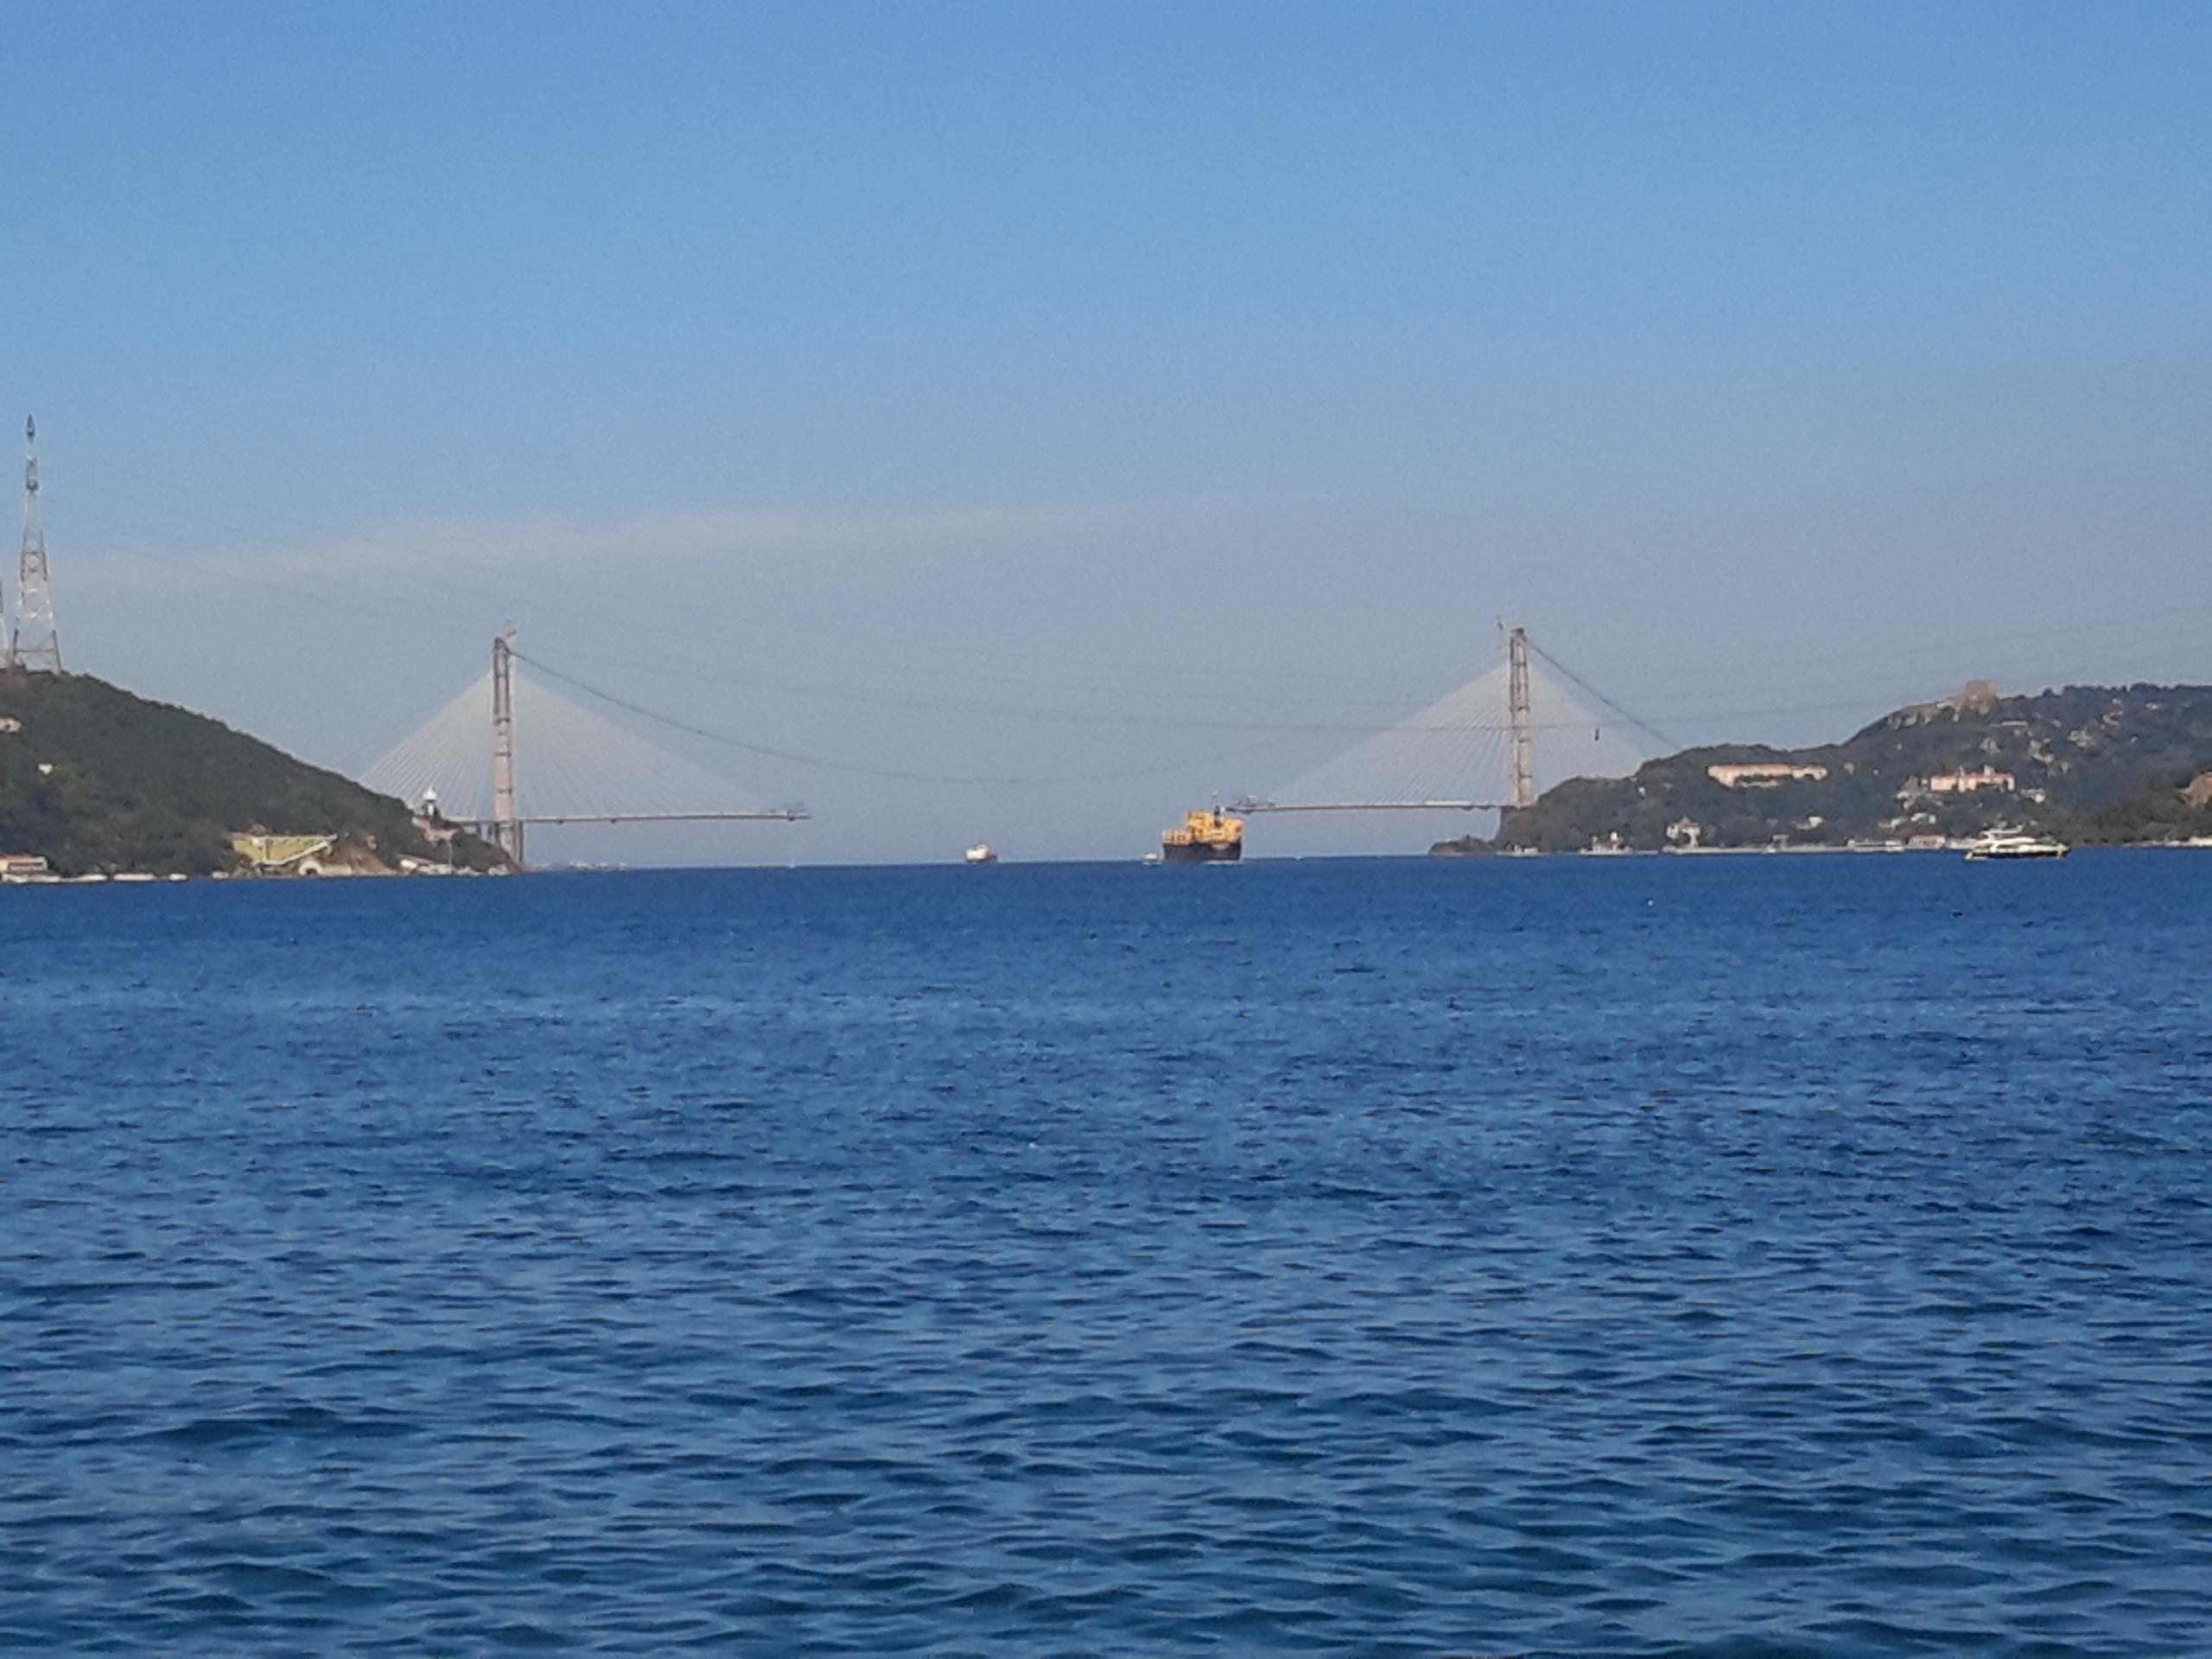 Crônicas de Istambul – Turquia: lugar de megaprojetos de infraestrutura